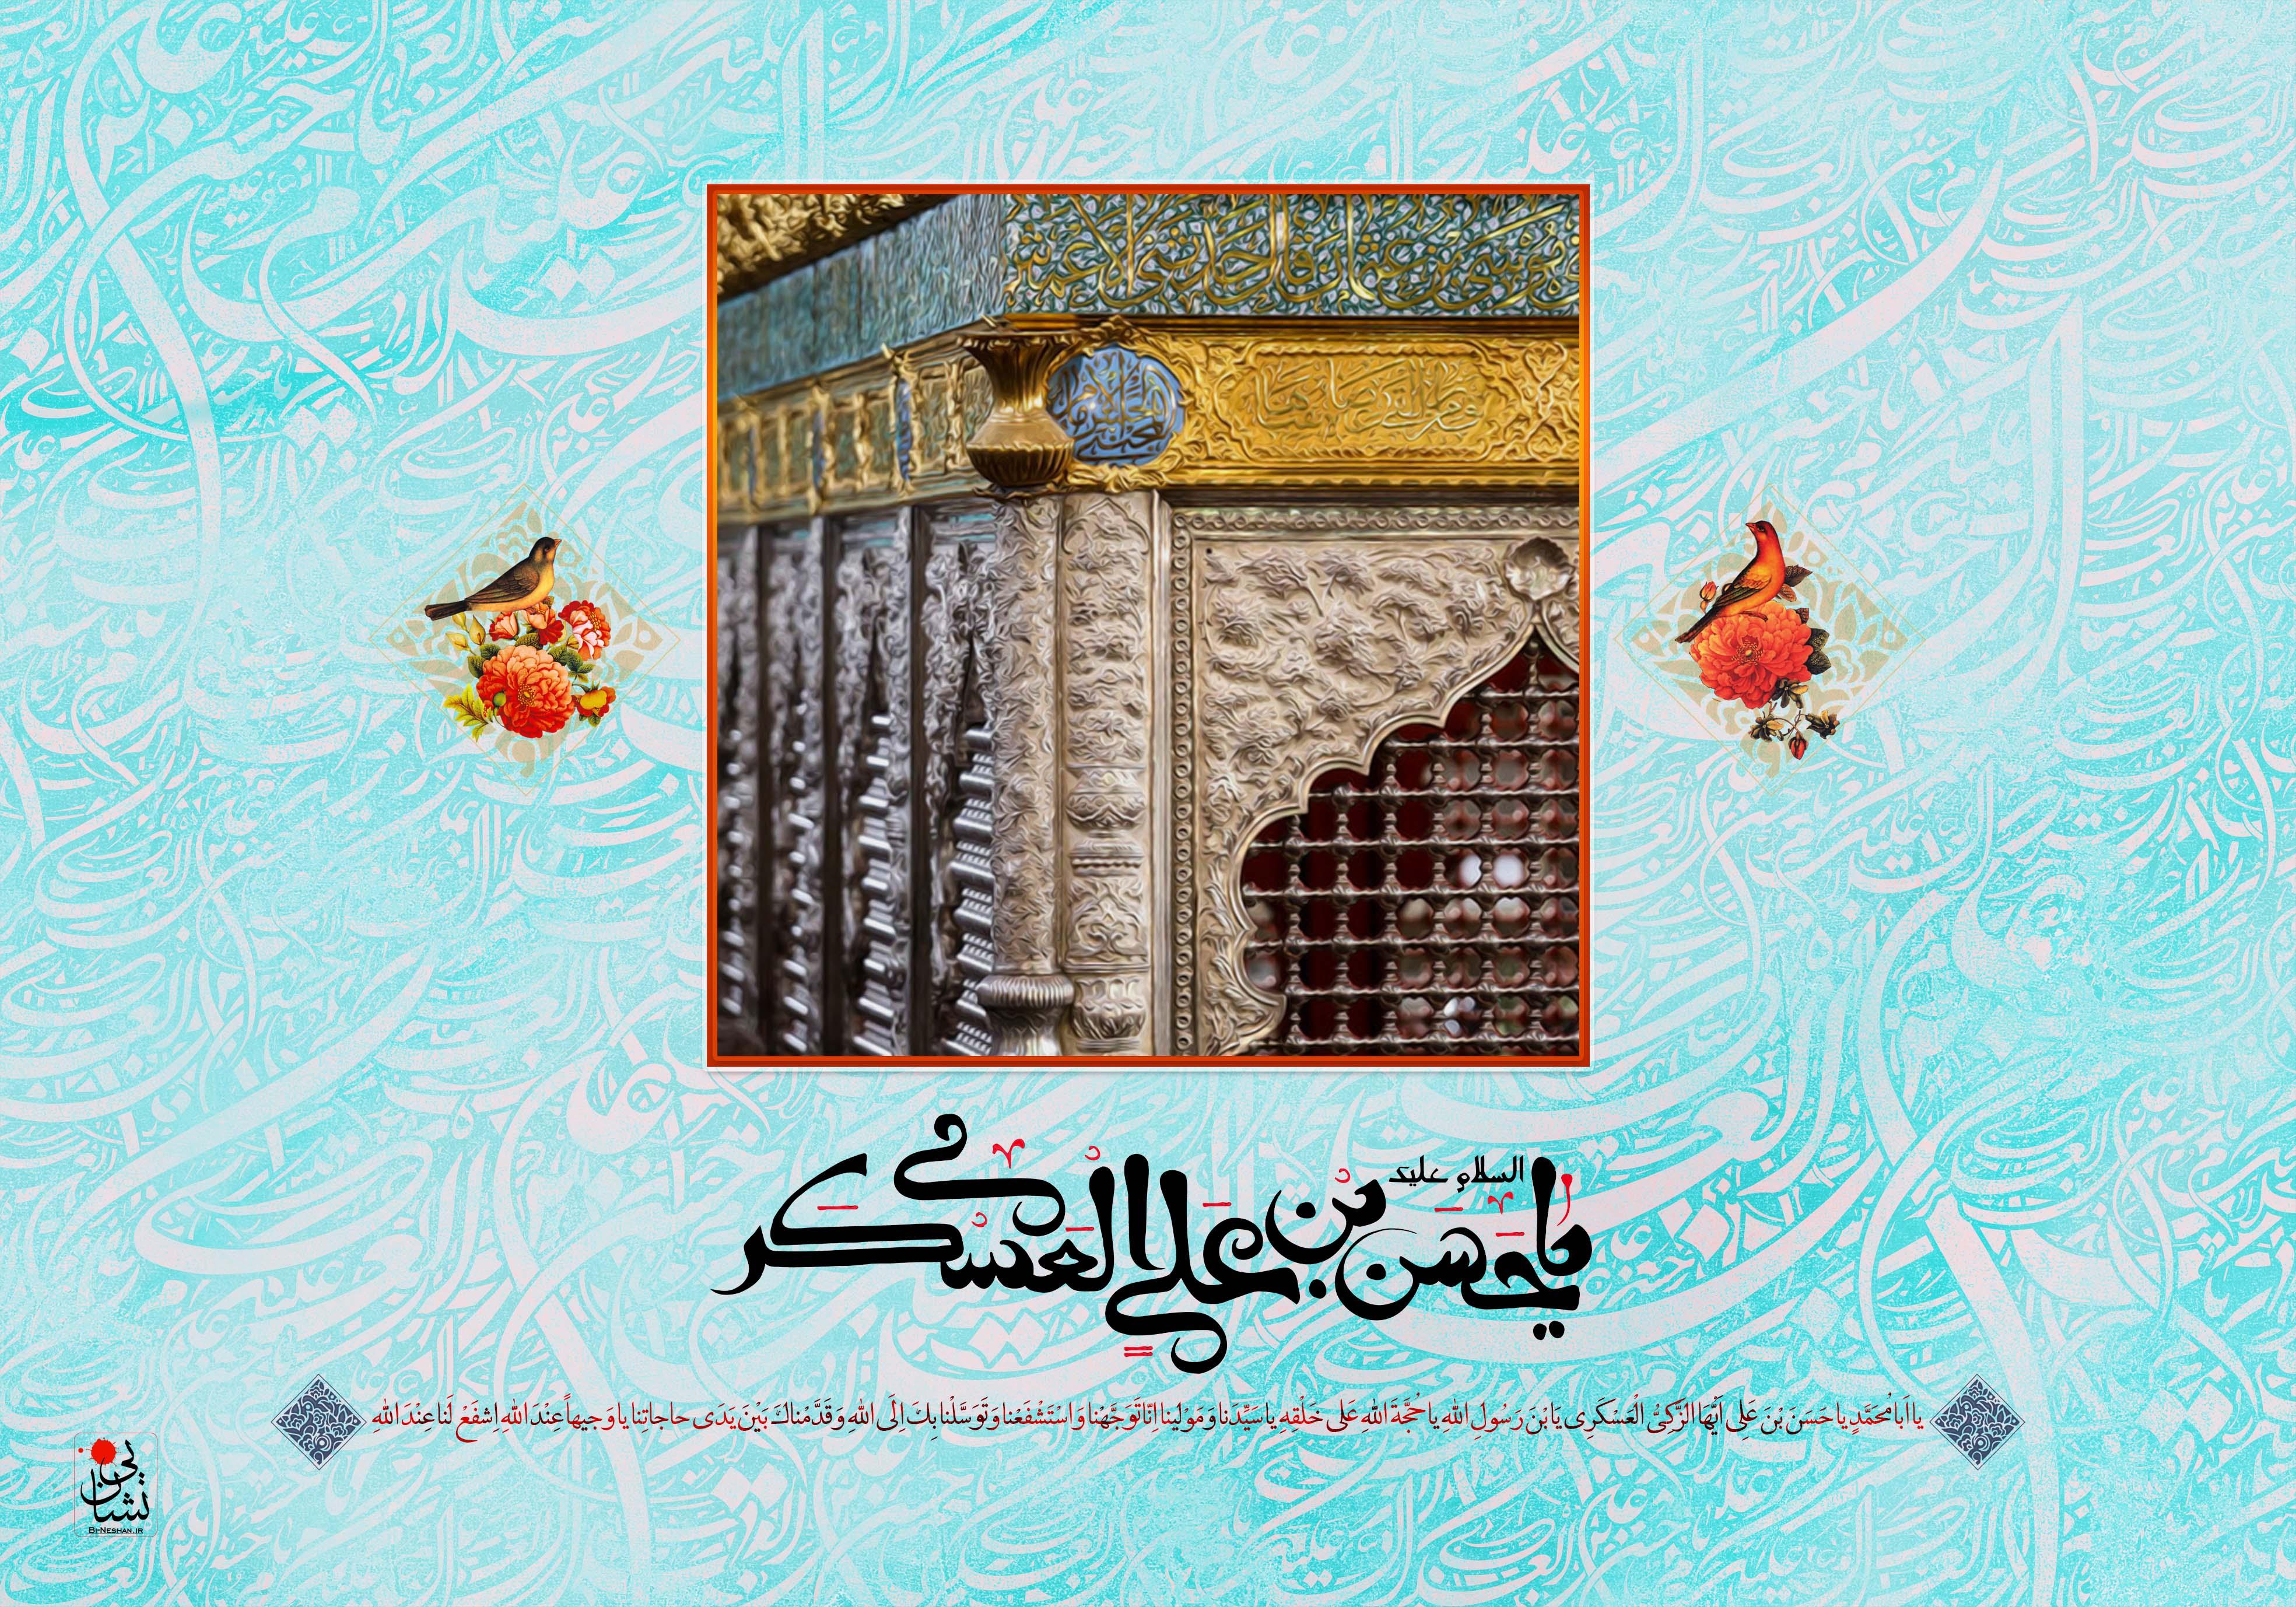 http://bi-neshan.ir/wp-content/uploads/2016/01/E.Assgharia-12.jpg